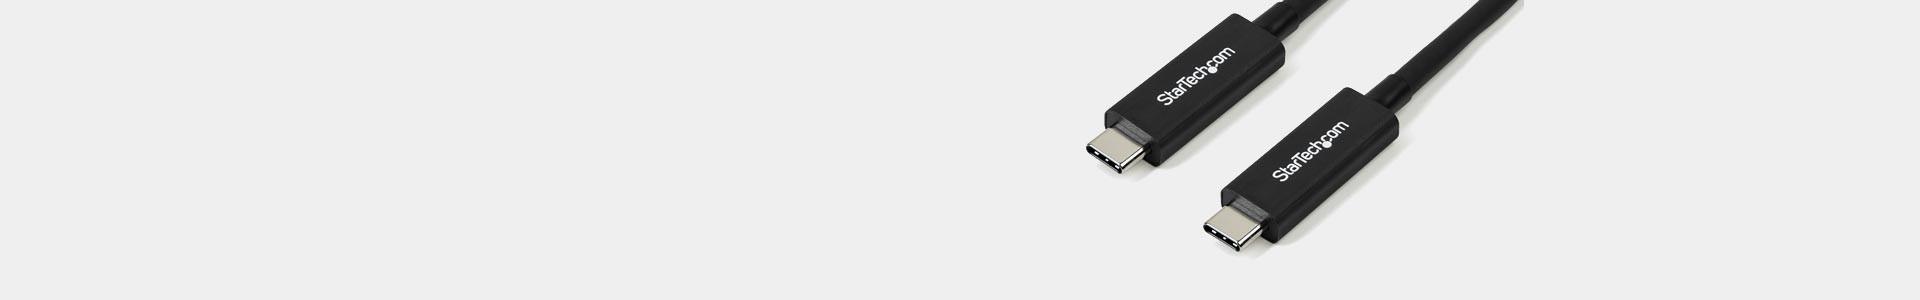 Cables Thunderbolt para aplicaciones audiovisuales - Avacab